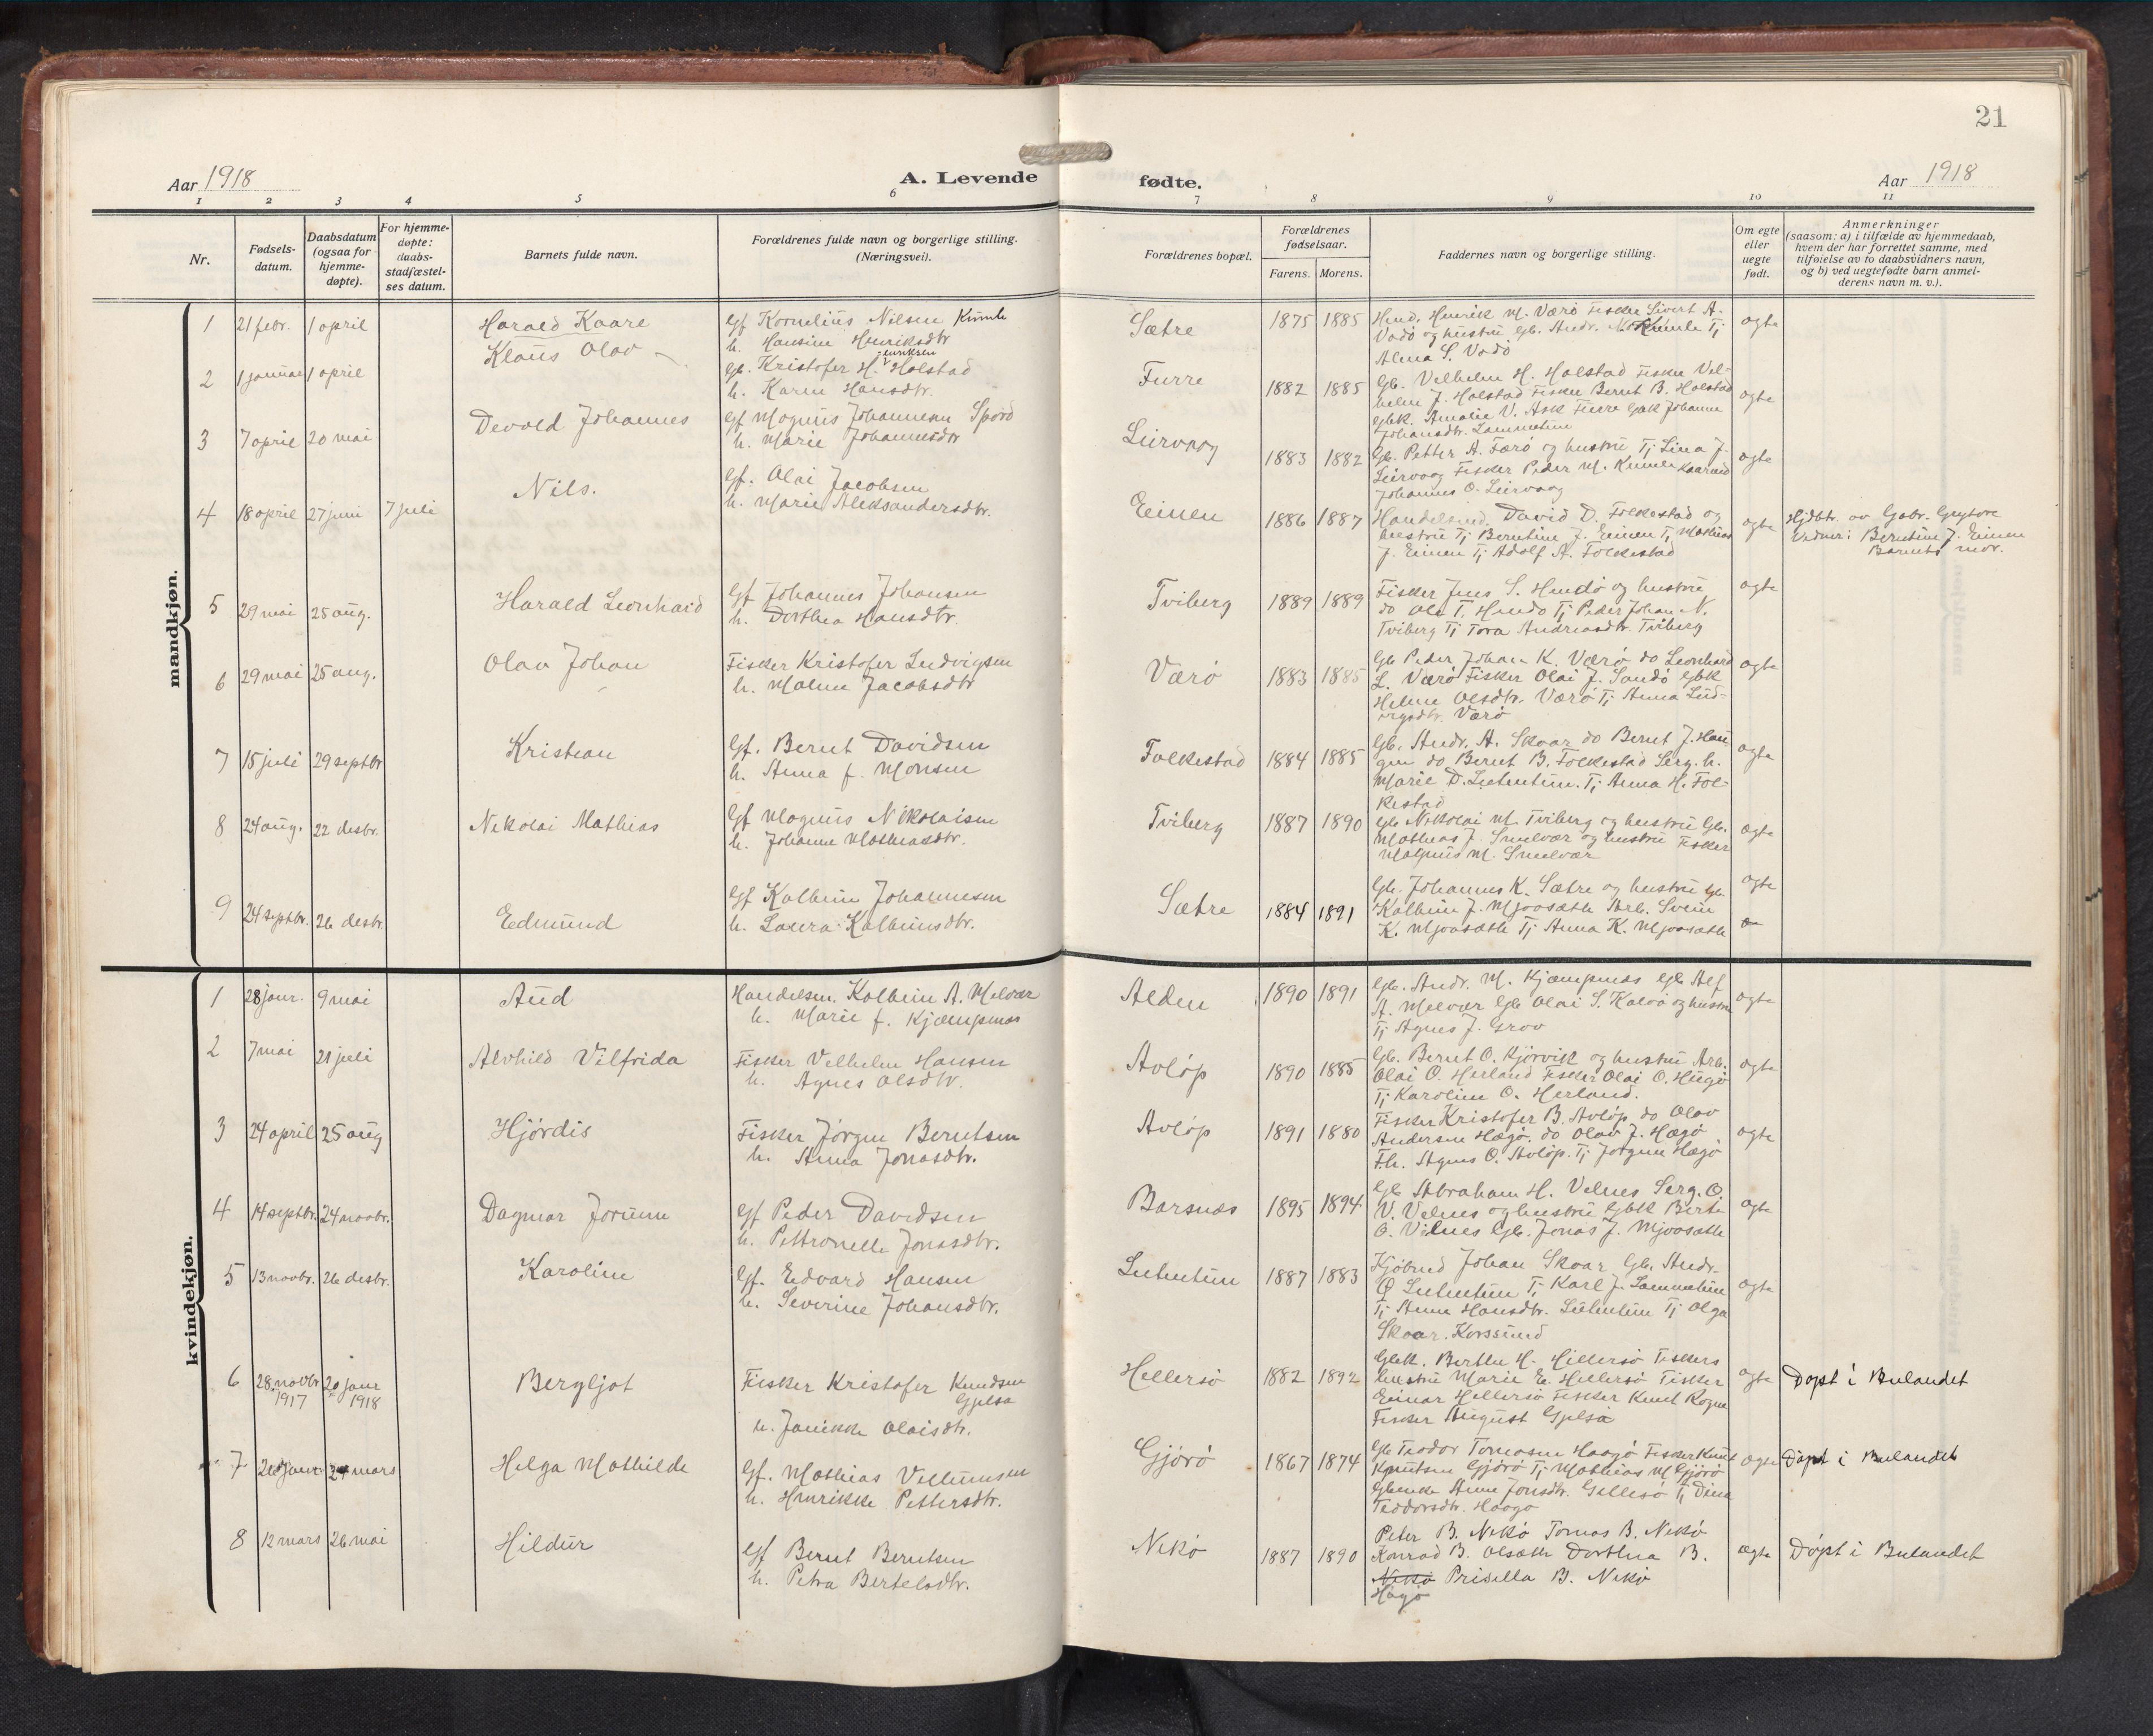 SAB, Askvoll sokneprestembete, H/Hab/Habb/L0002: Klokkerbok nr. B 2, 1910-1947, s. 20b-21a